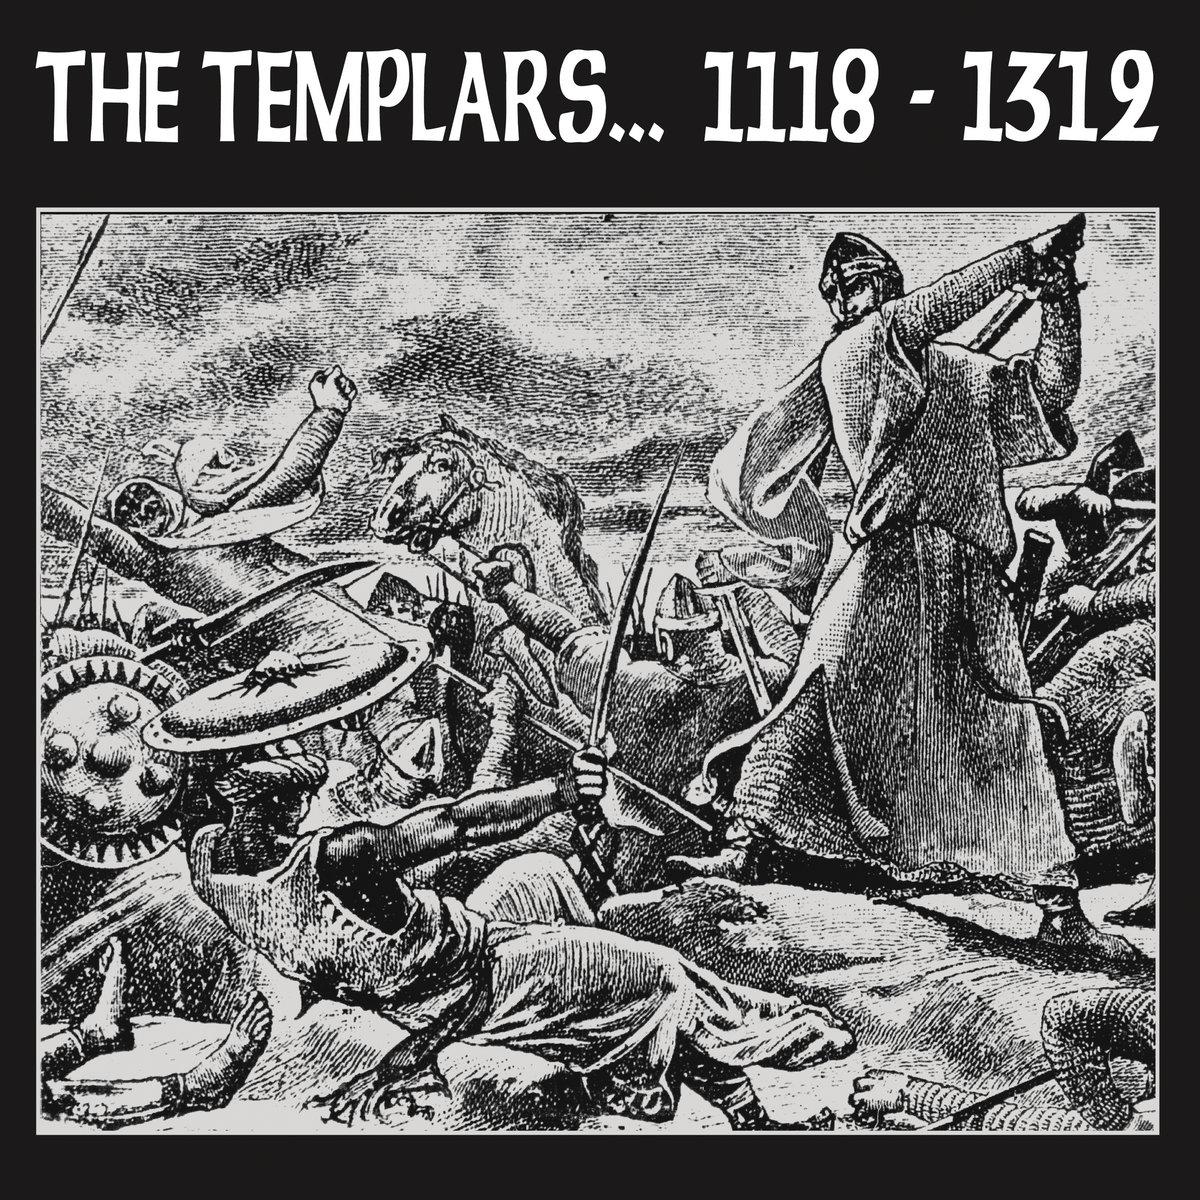 1118-1312 | The Templars